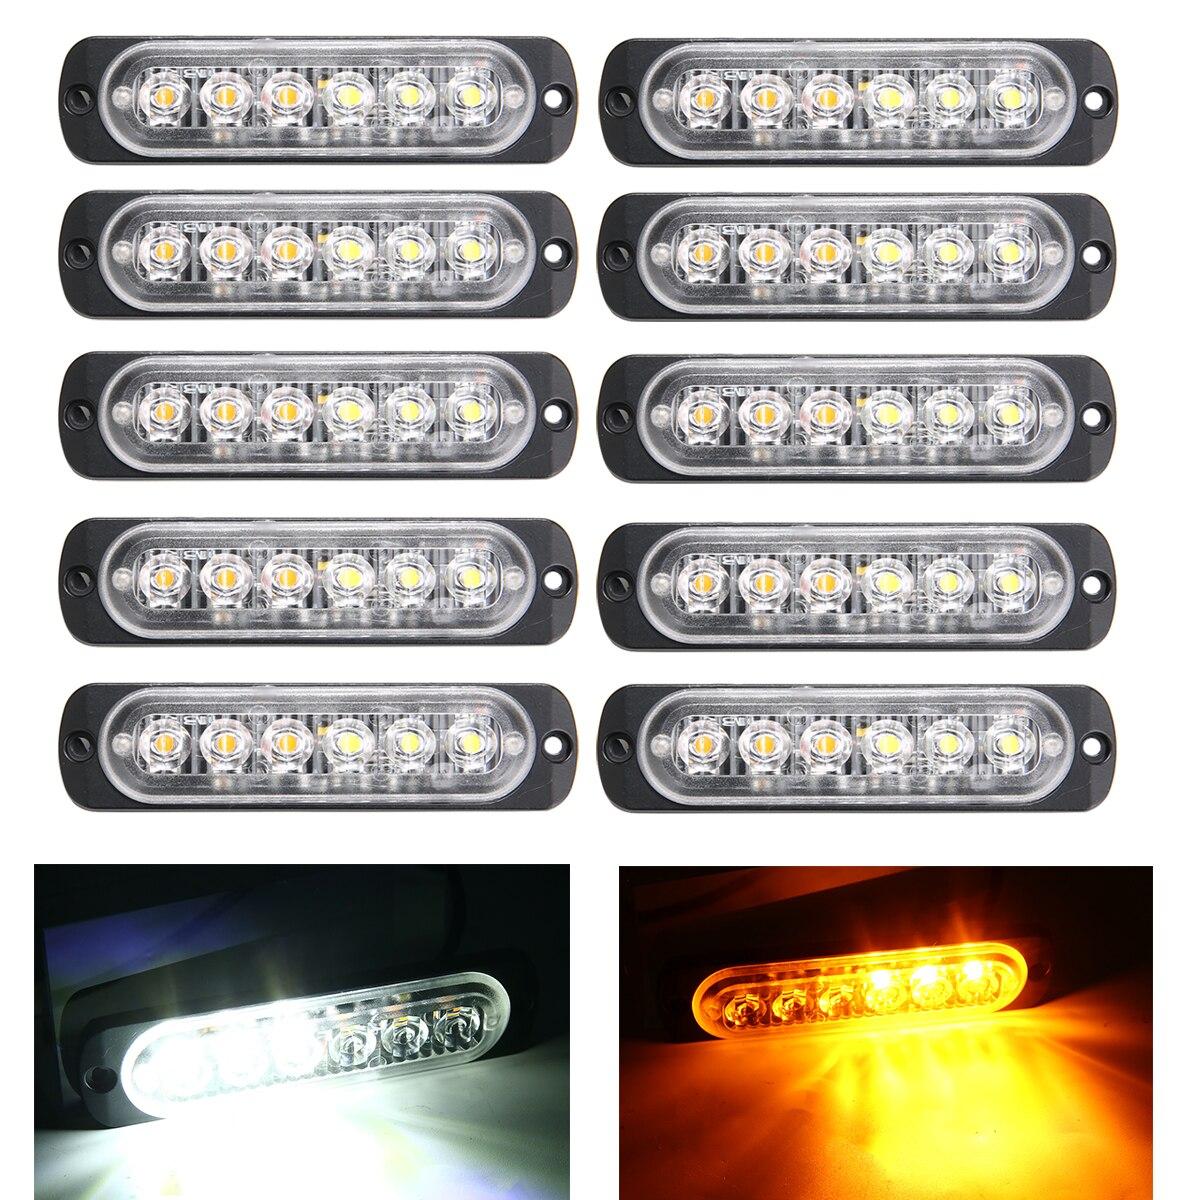 10pcs DC12V/24V 18 Modes 6LED Car Truck Light Rectangular Waterproof Emergency Beacon Warning Hazard Flash Strobe Light